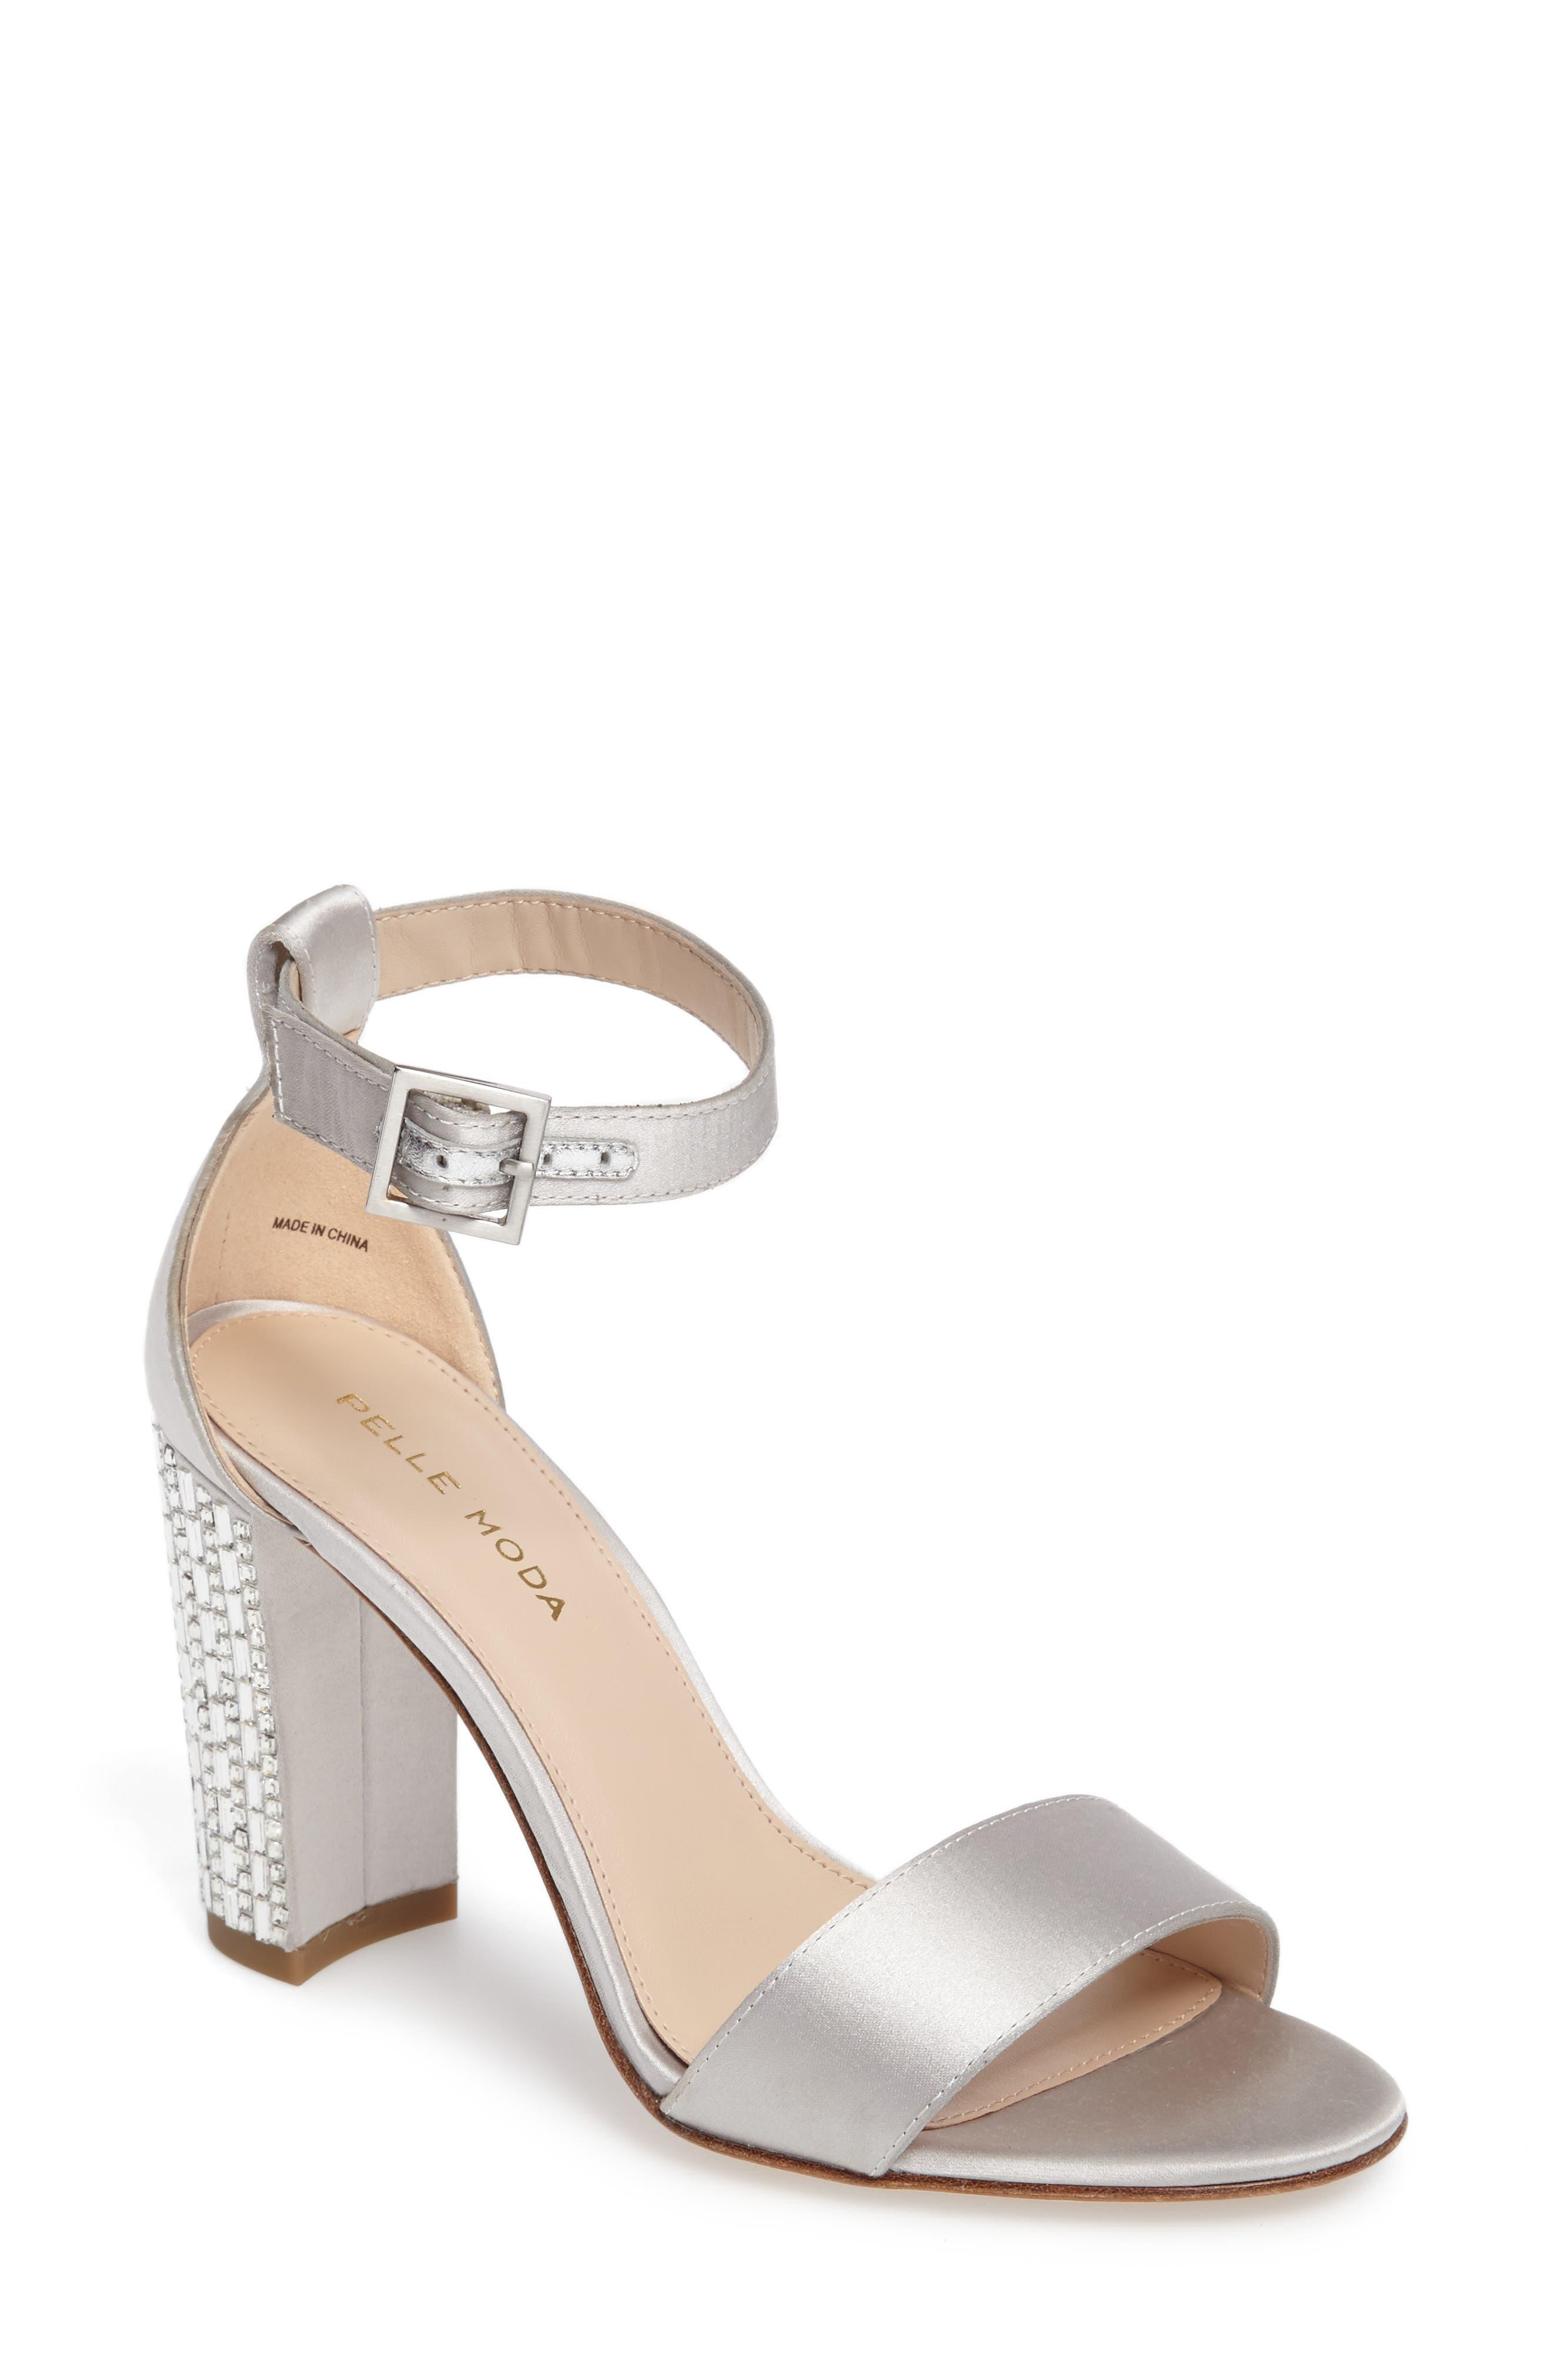 Main Image - Pelle Moda Bonnie 3 Embellished Ankle Strap Sandal (Women)